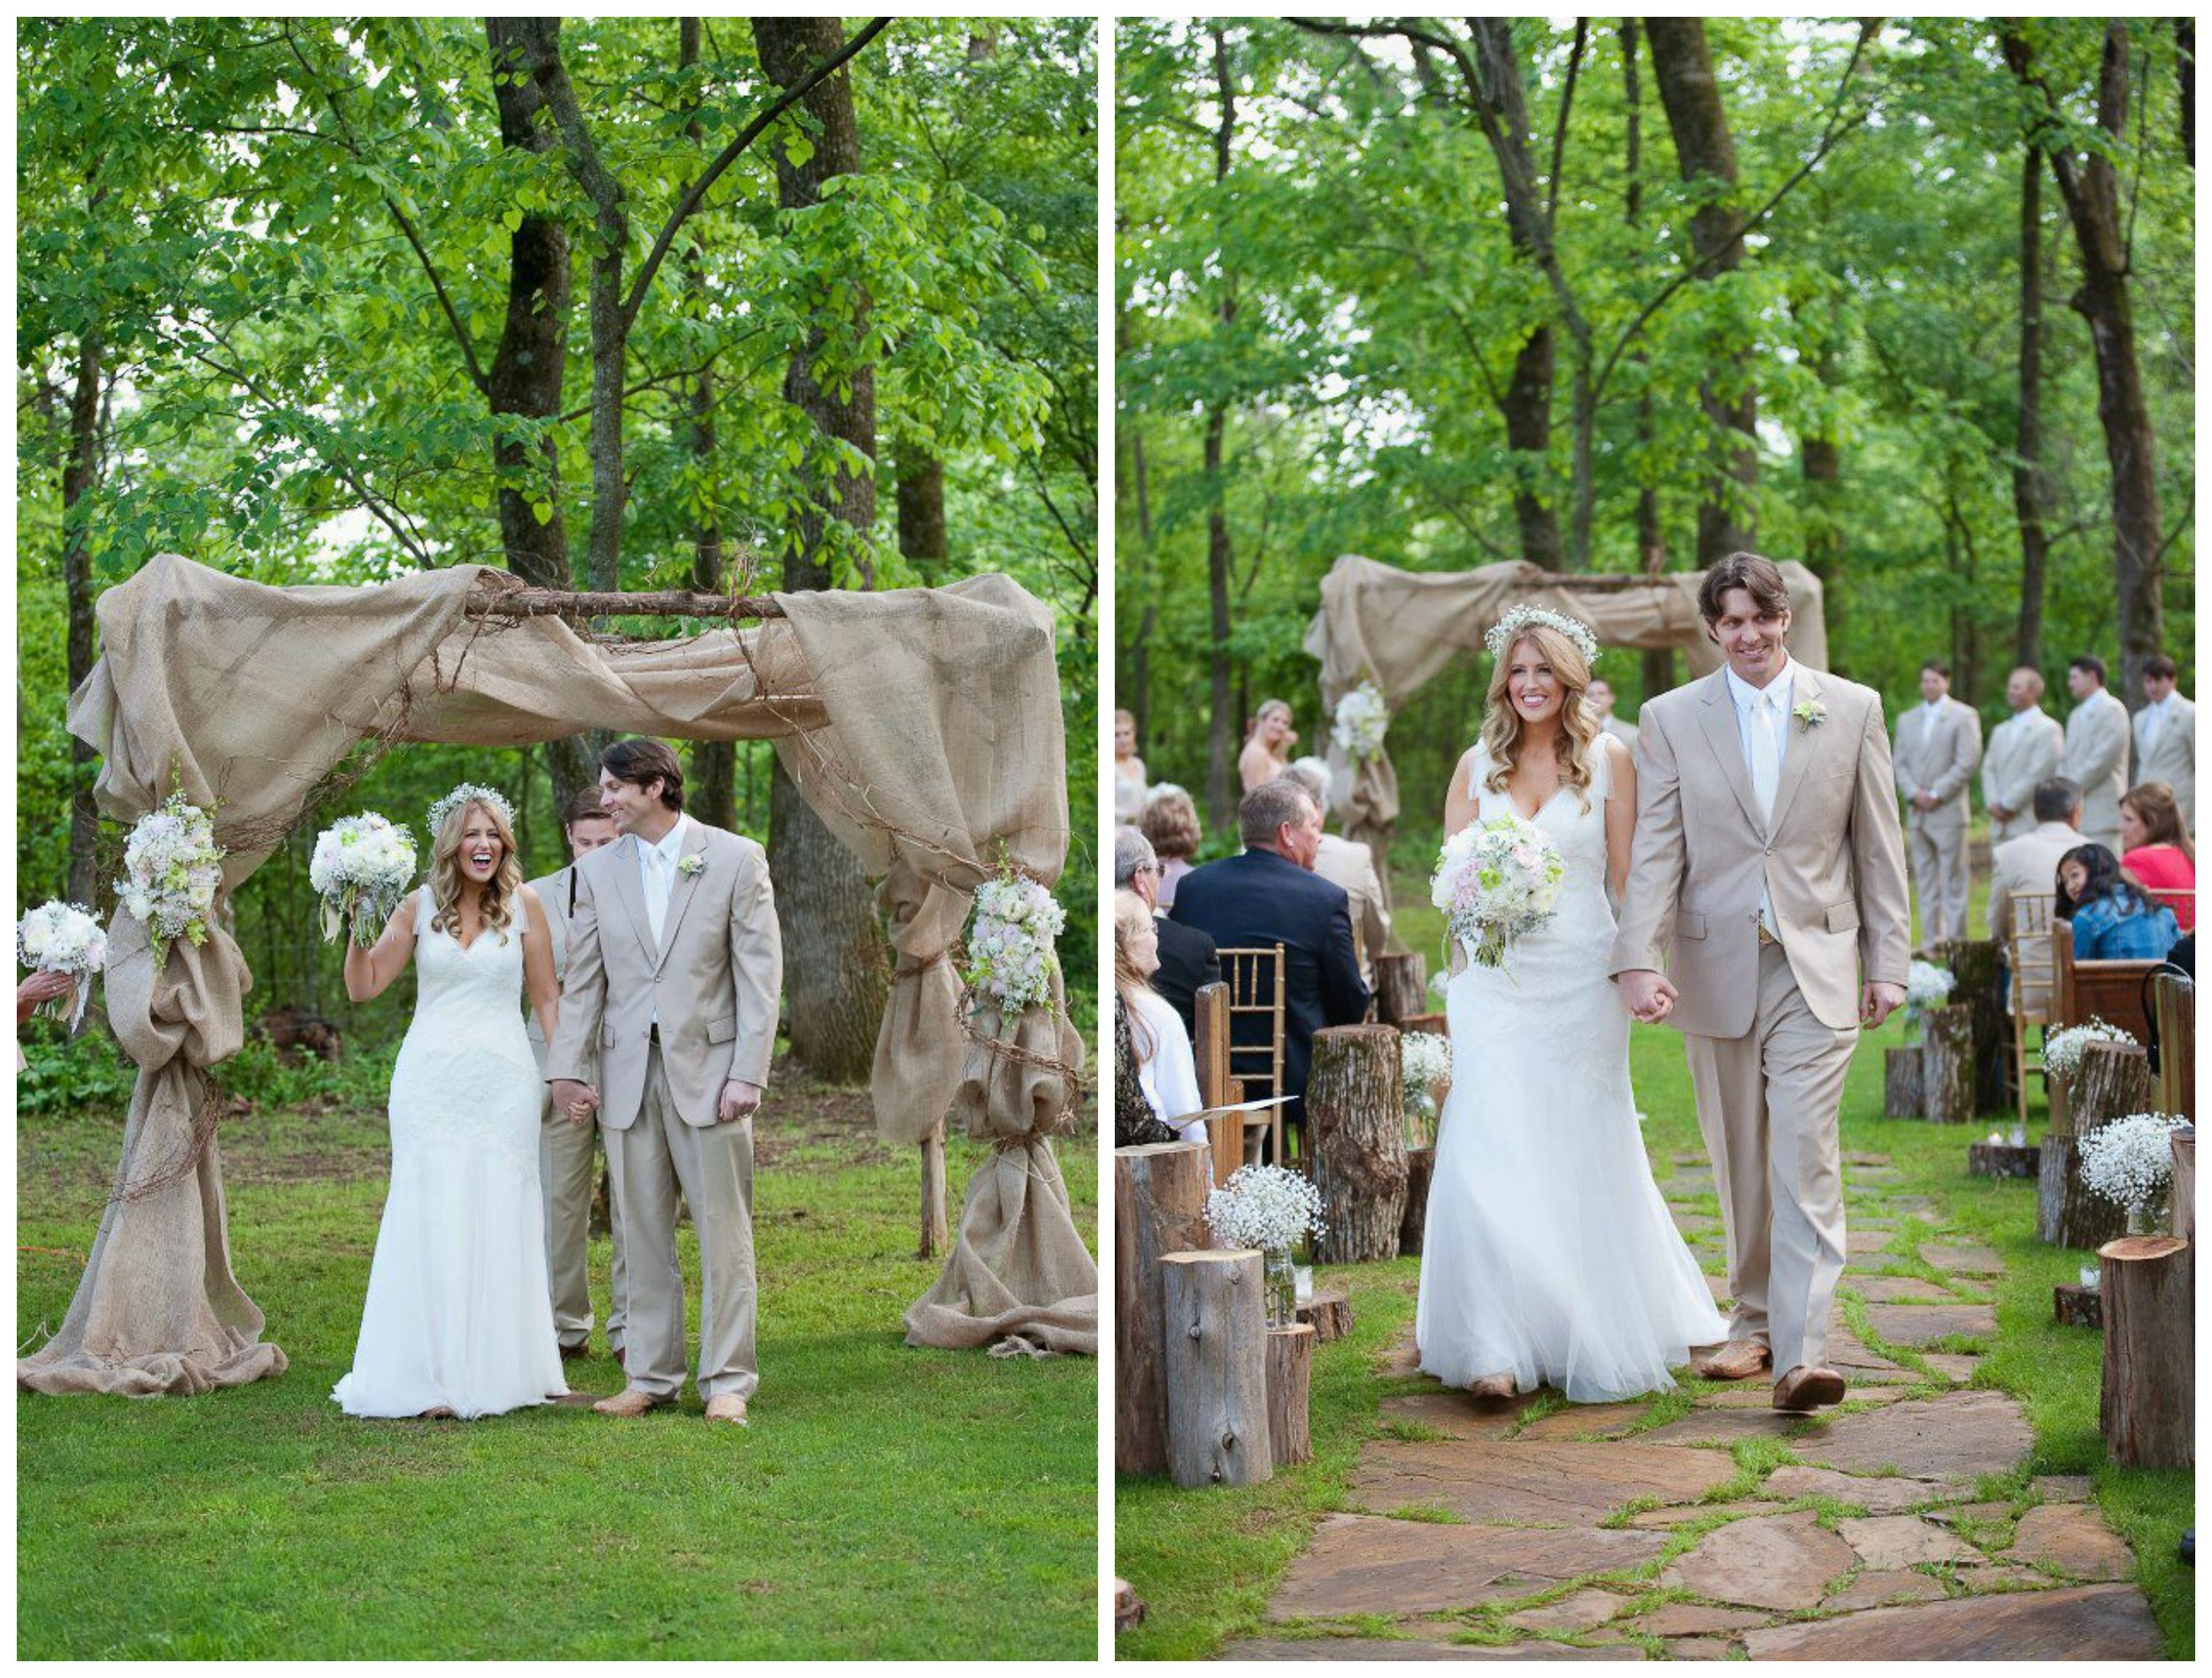 Elizabeth Leighton Photography , from  Mae Mae + Mike 's wedding